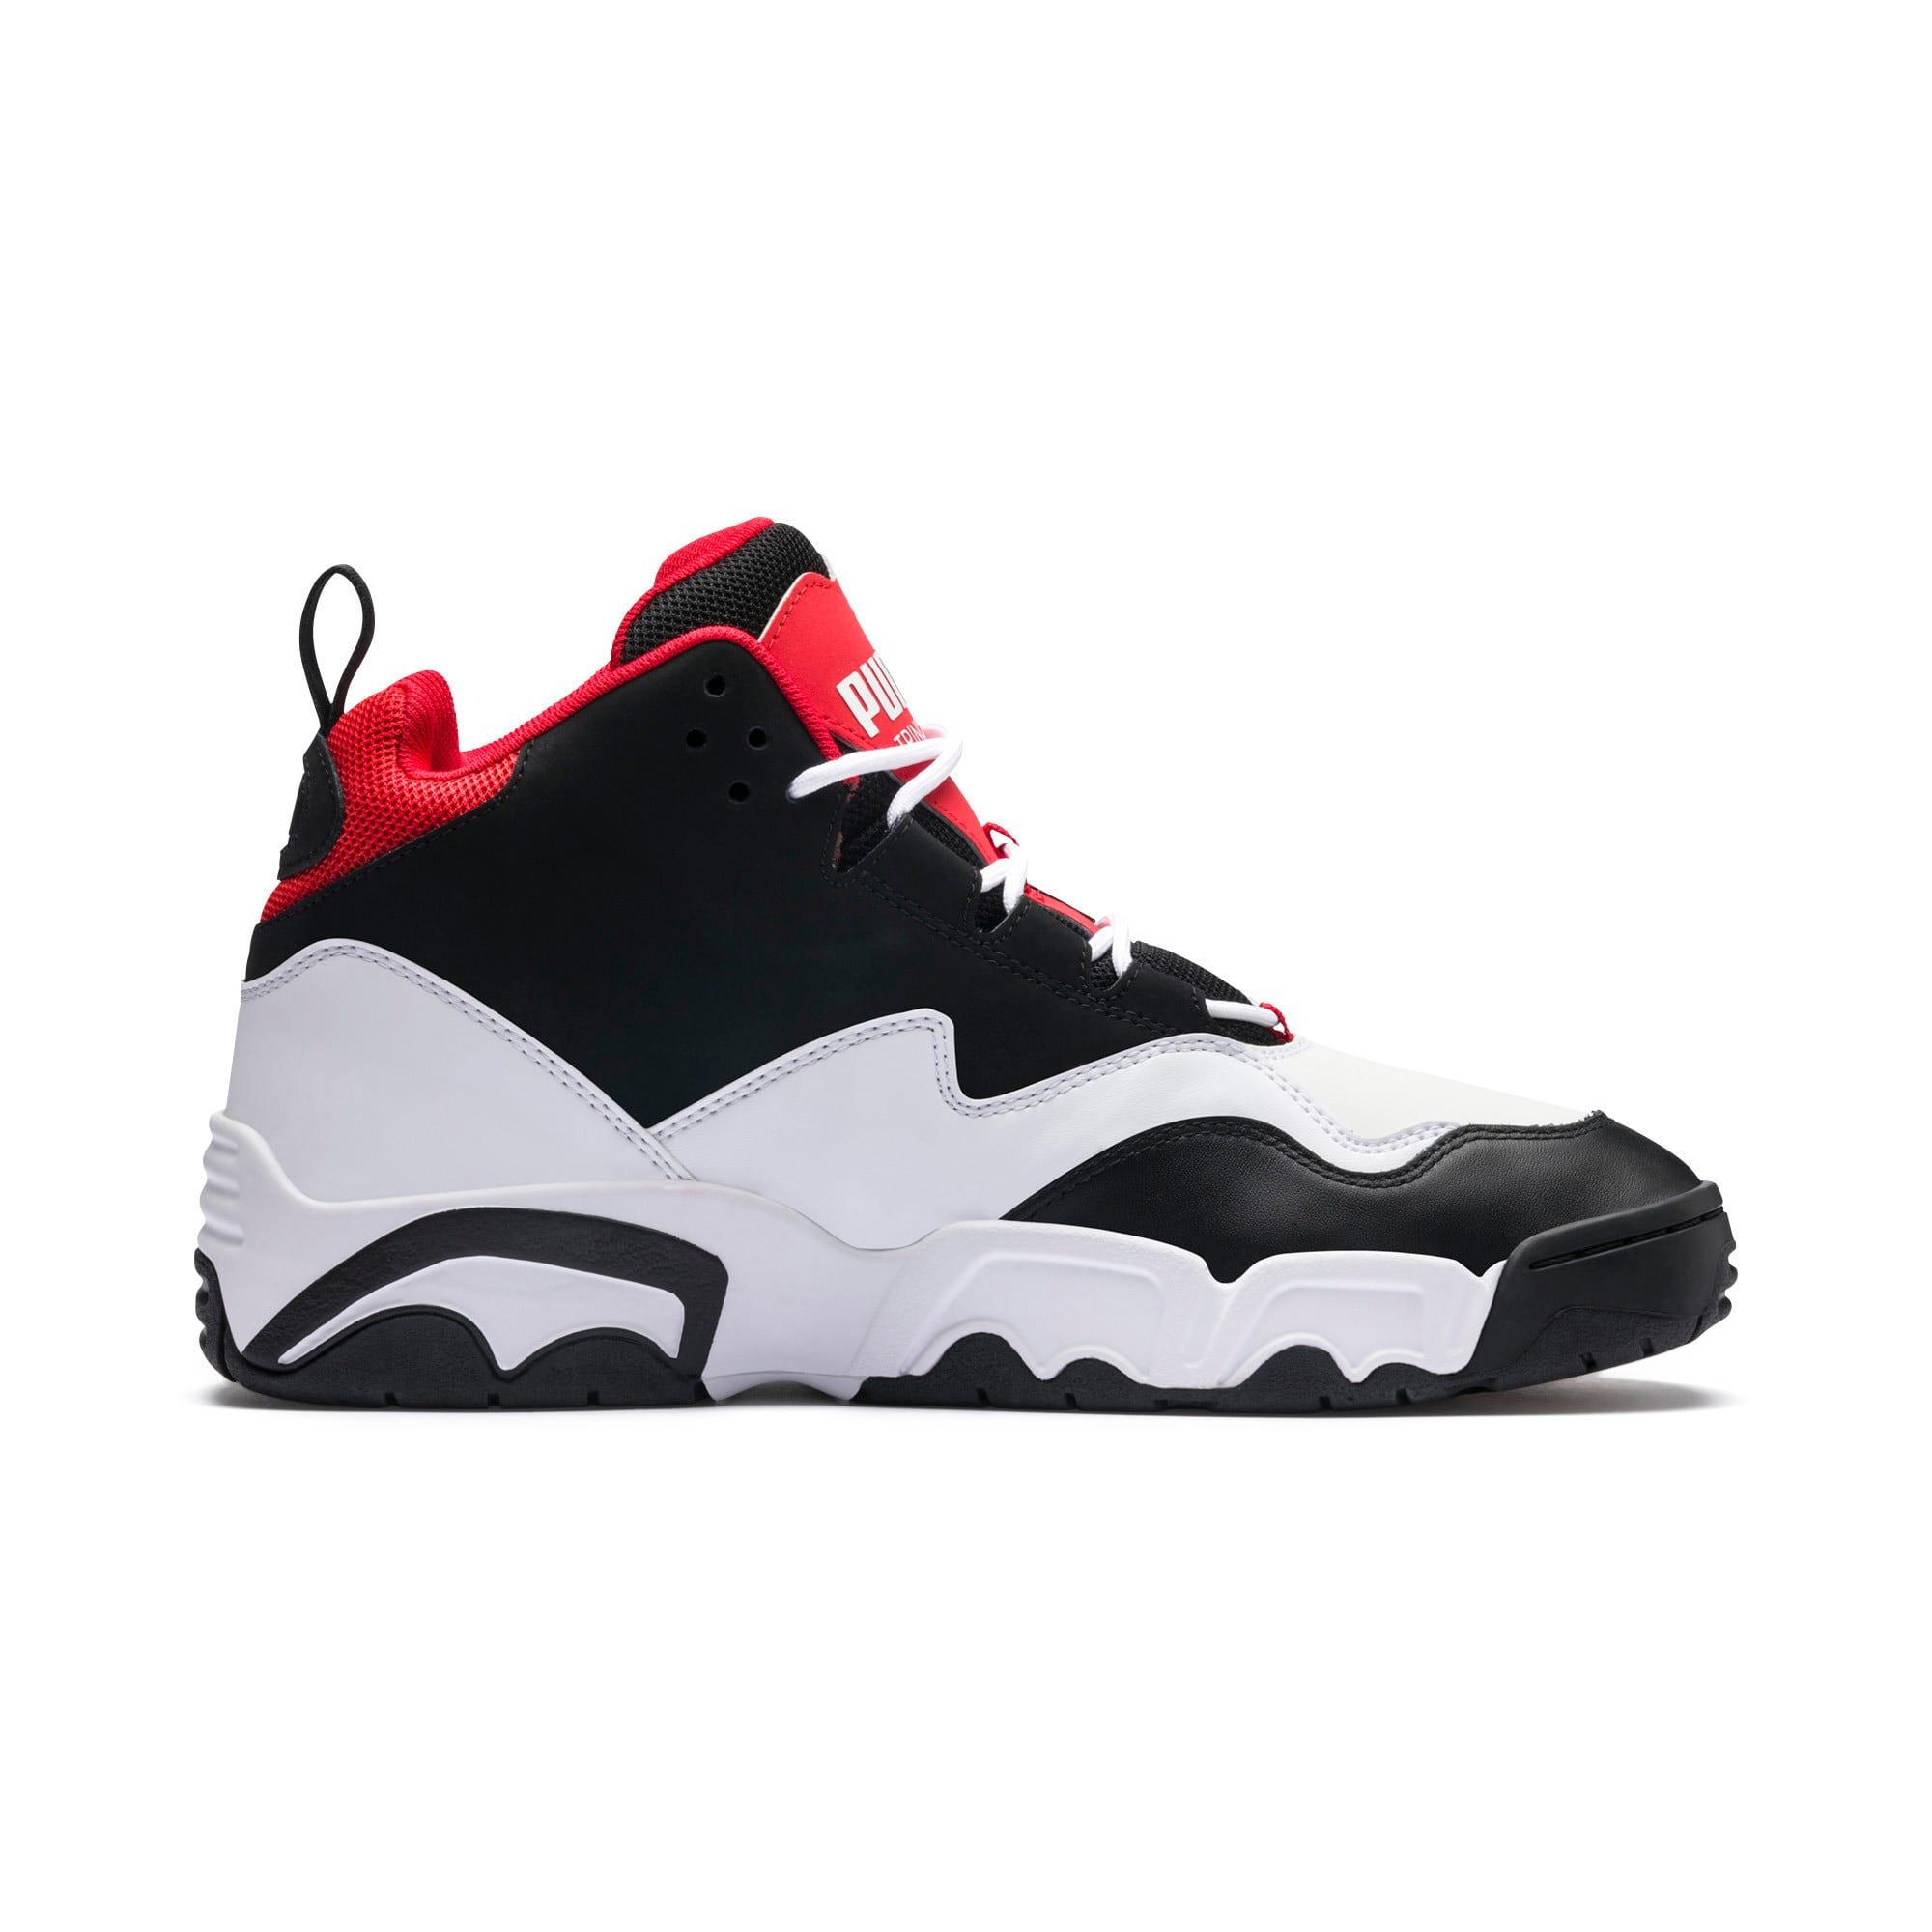 Miniatura 5 de Zapatos deportivos Source de caña media, Black- White-High Risk Red, mediano